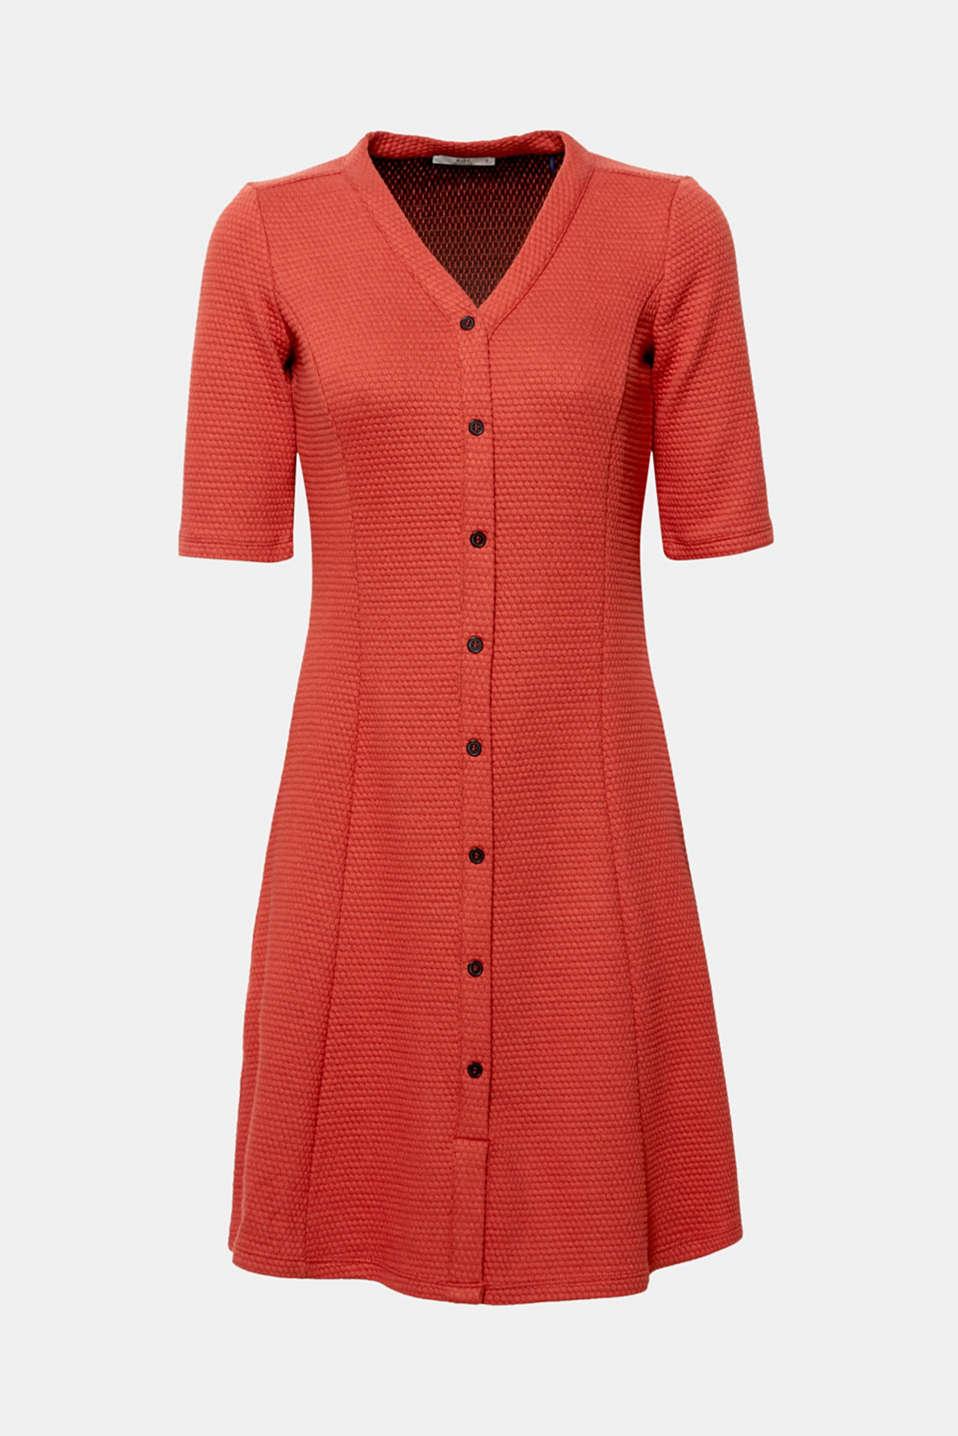 Dresses knitted, RUST ORANGE, detail image number 6